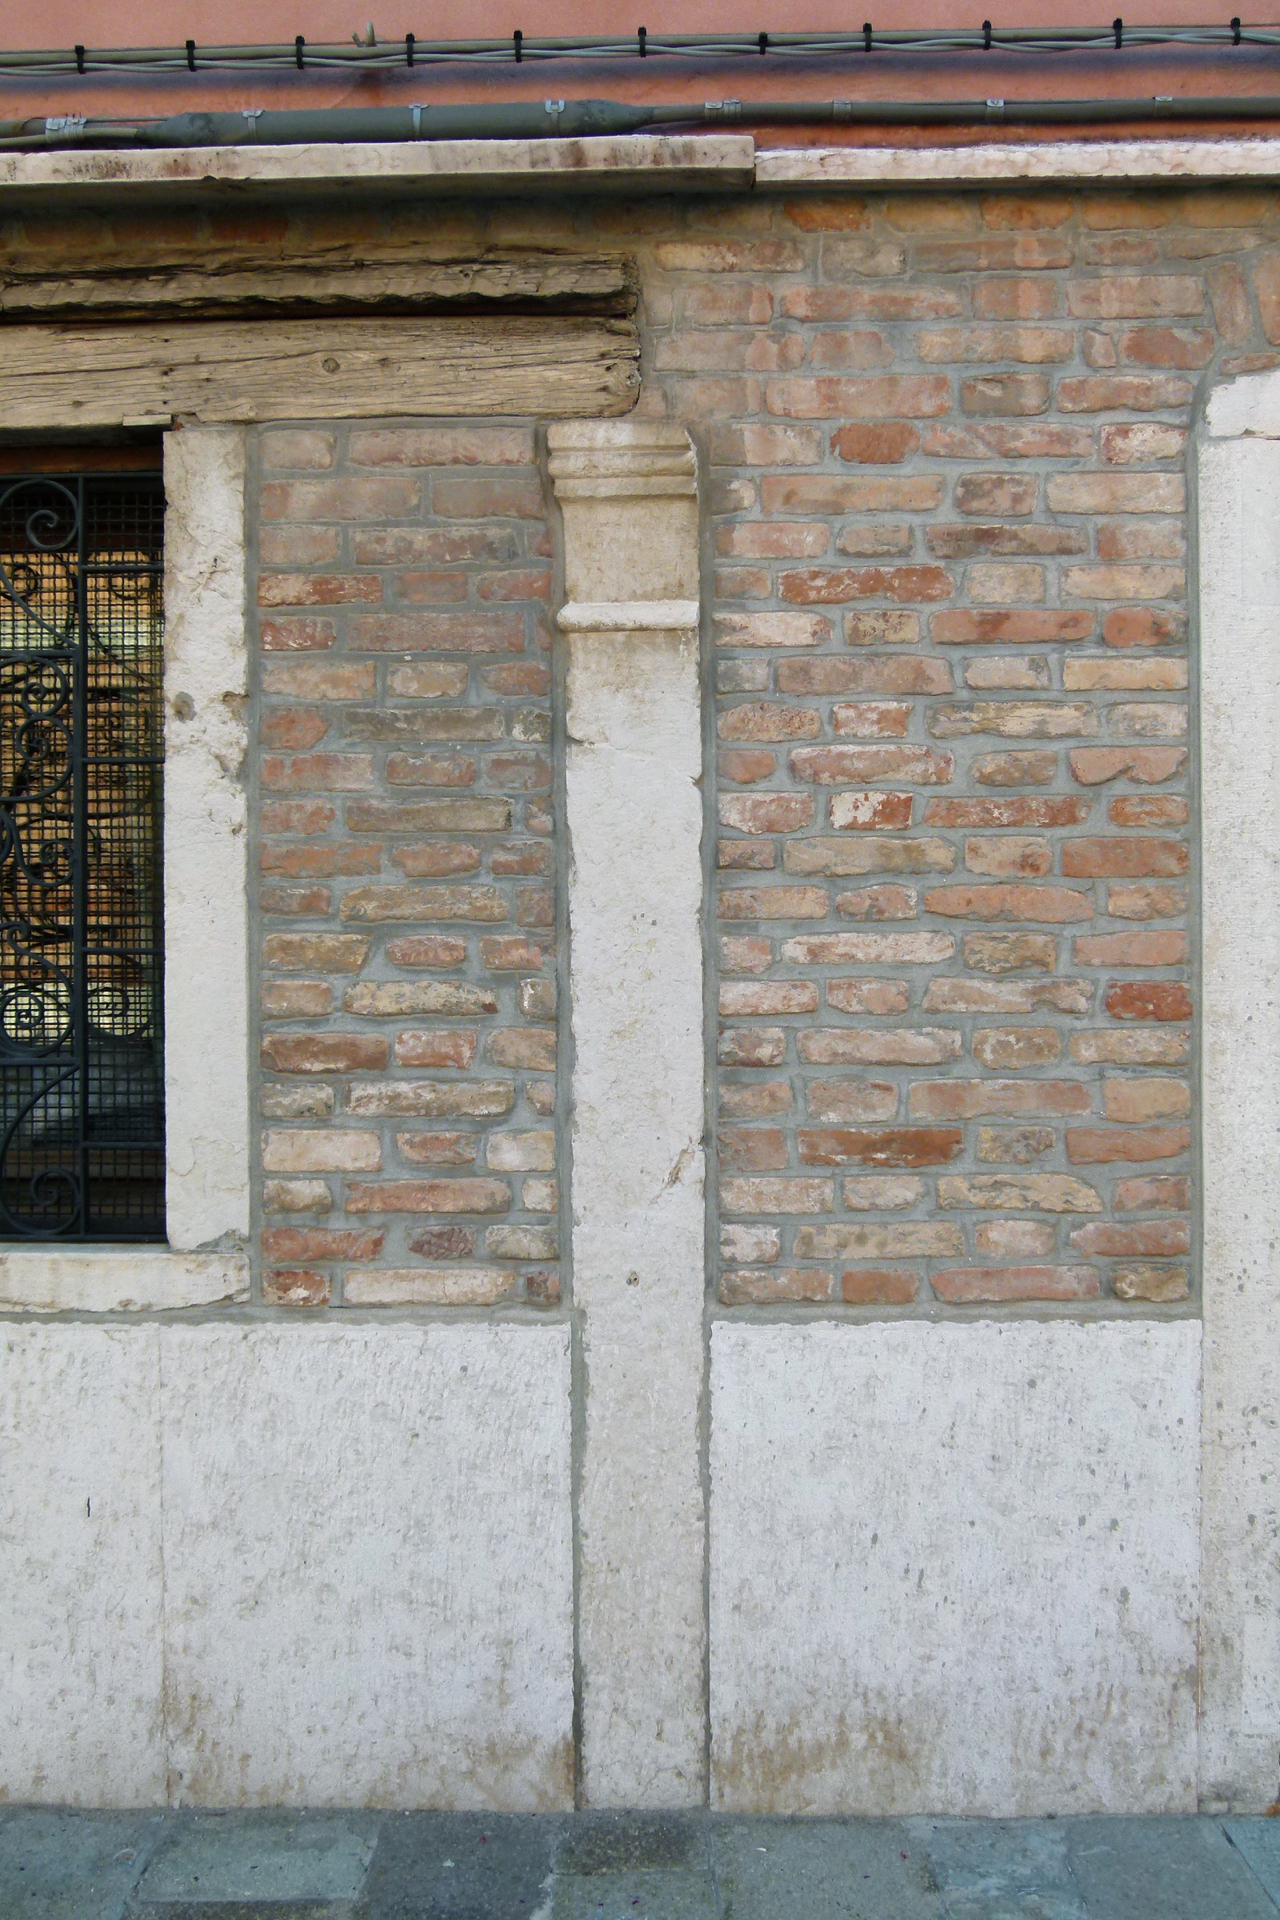 pilastro, insieme - ambito veneziano (secc. XVI-XVIII)